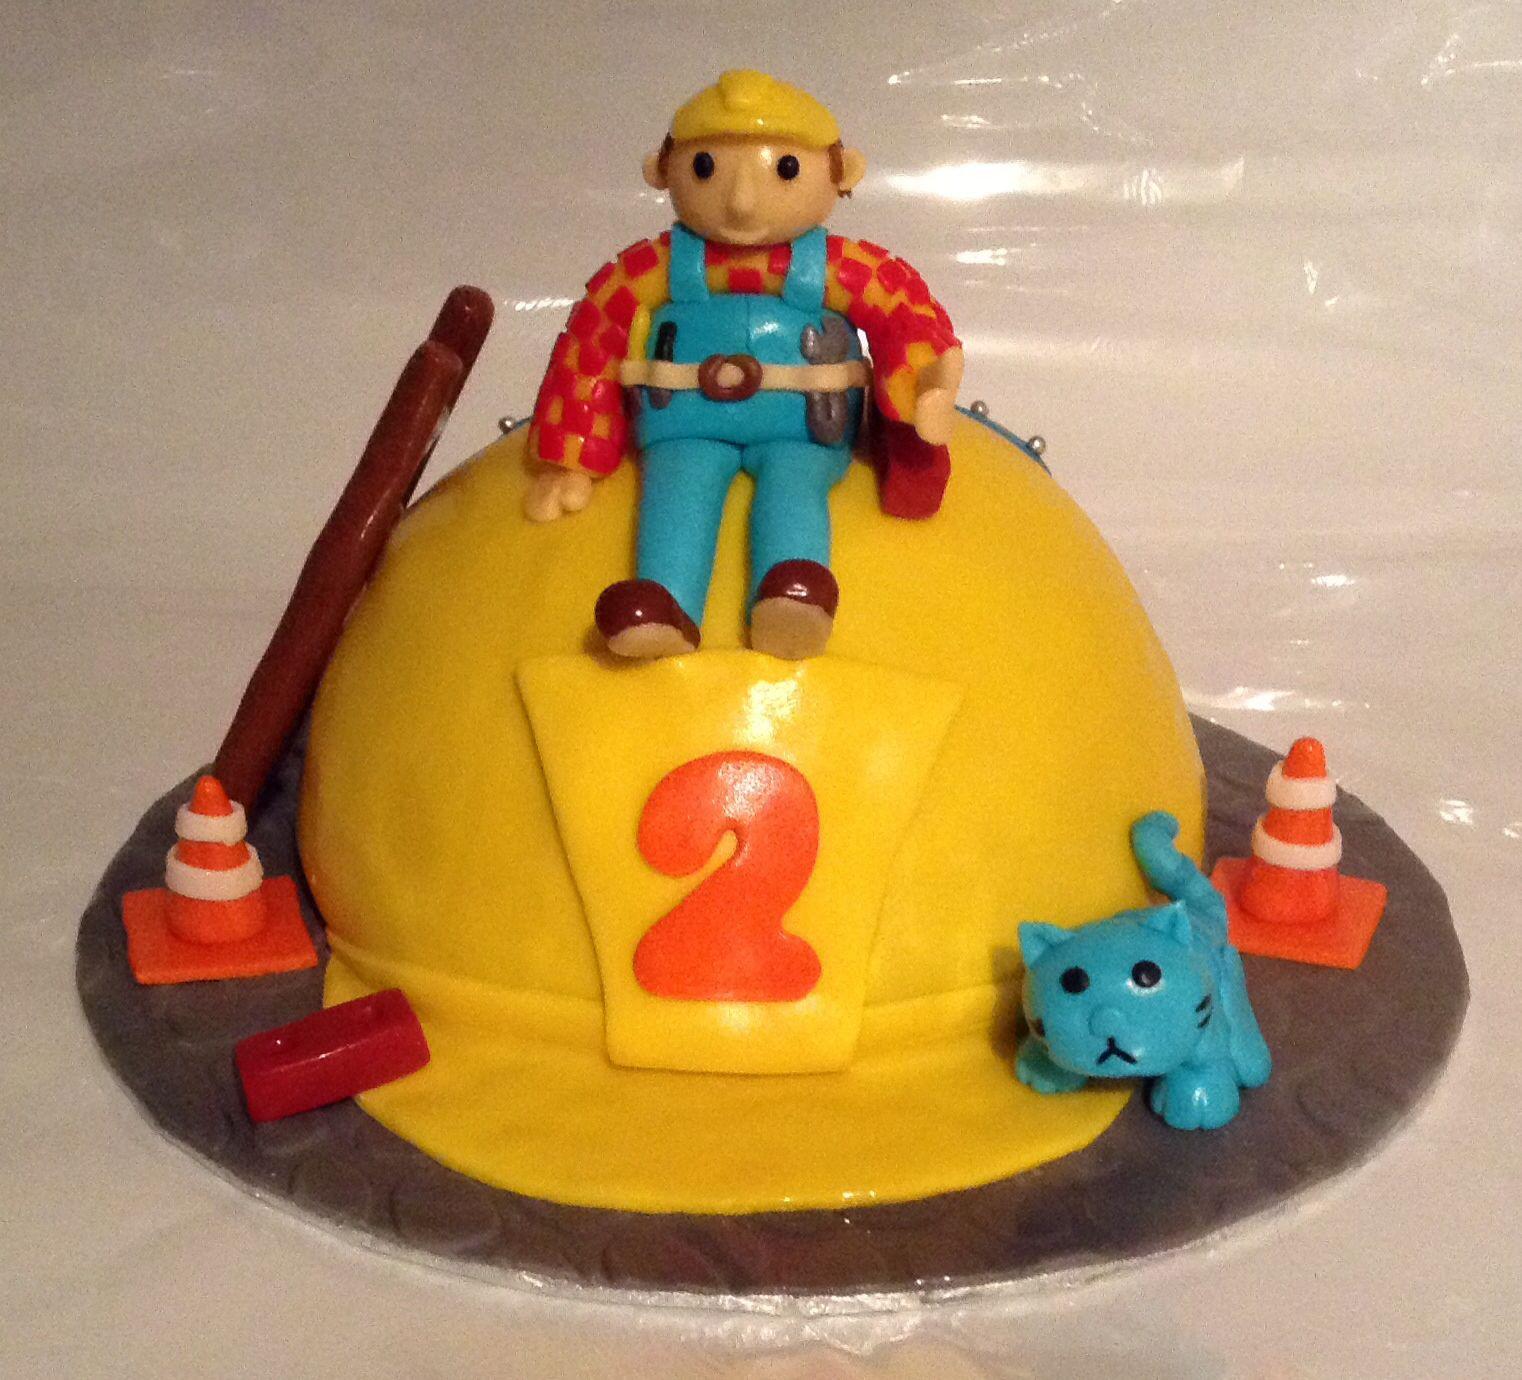 bob the builder cake pan instructions